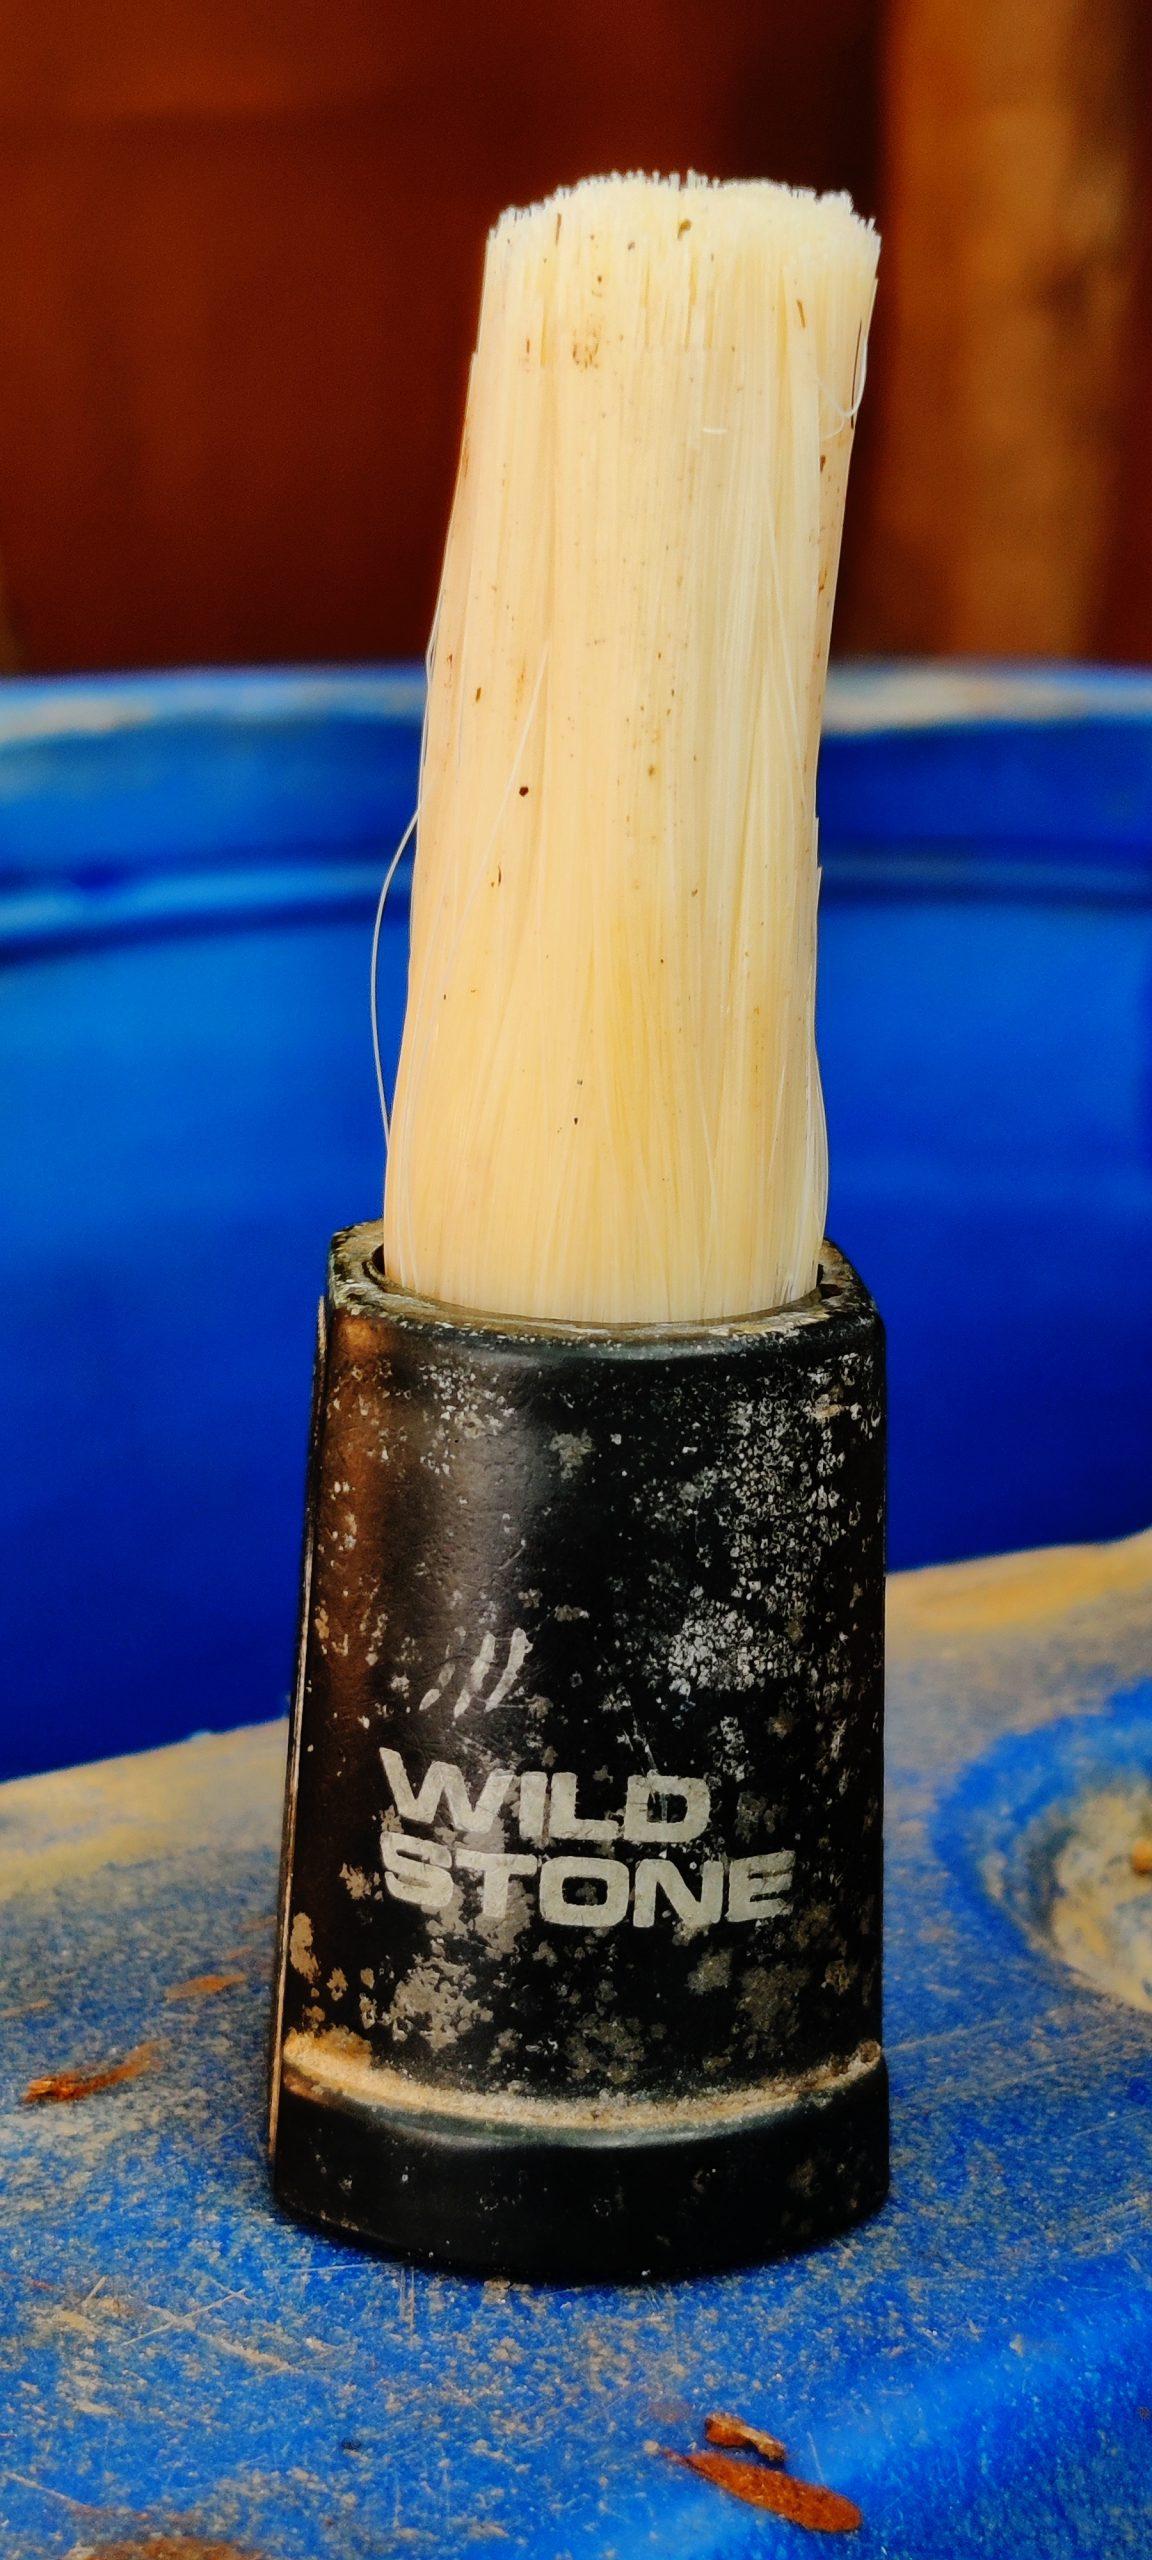 A shaving brush